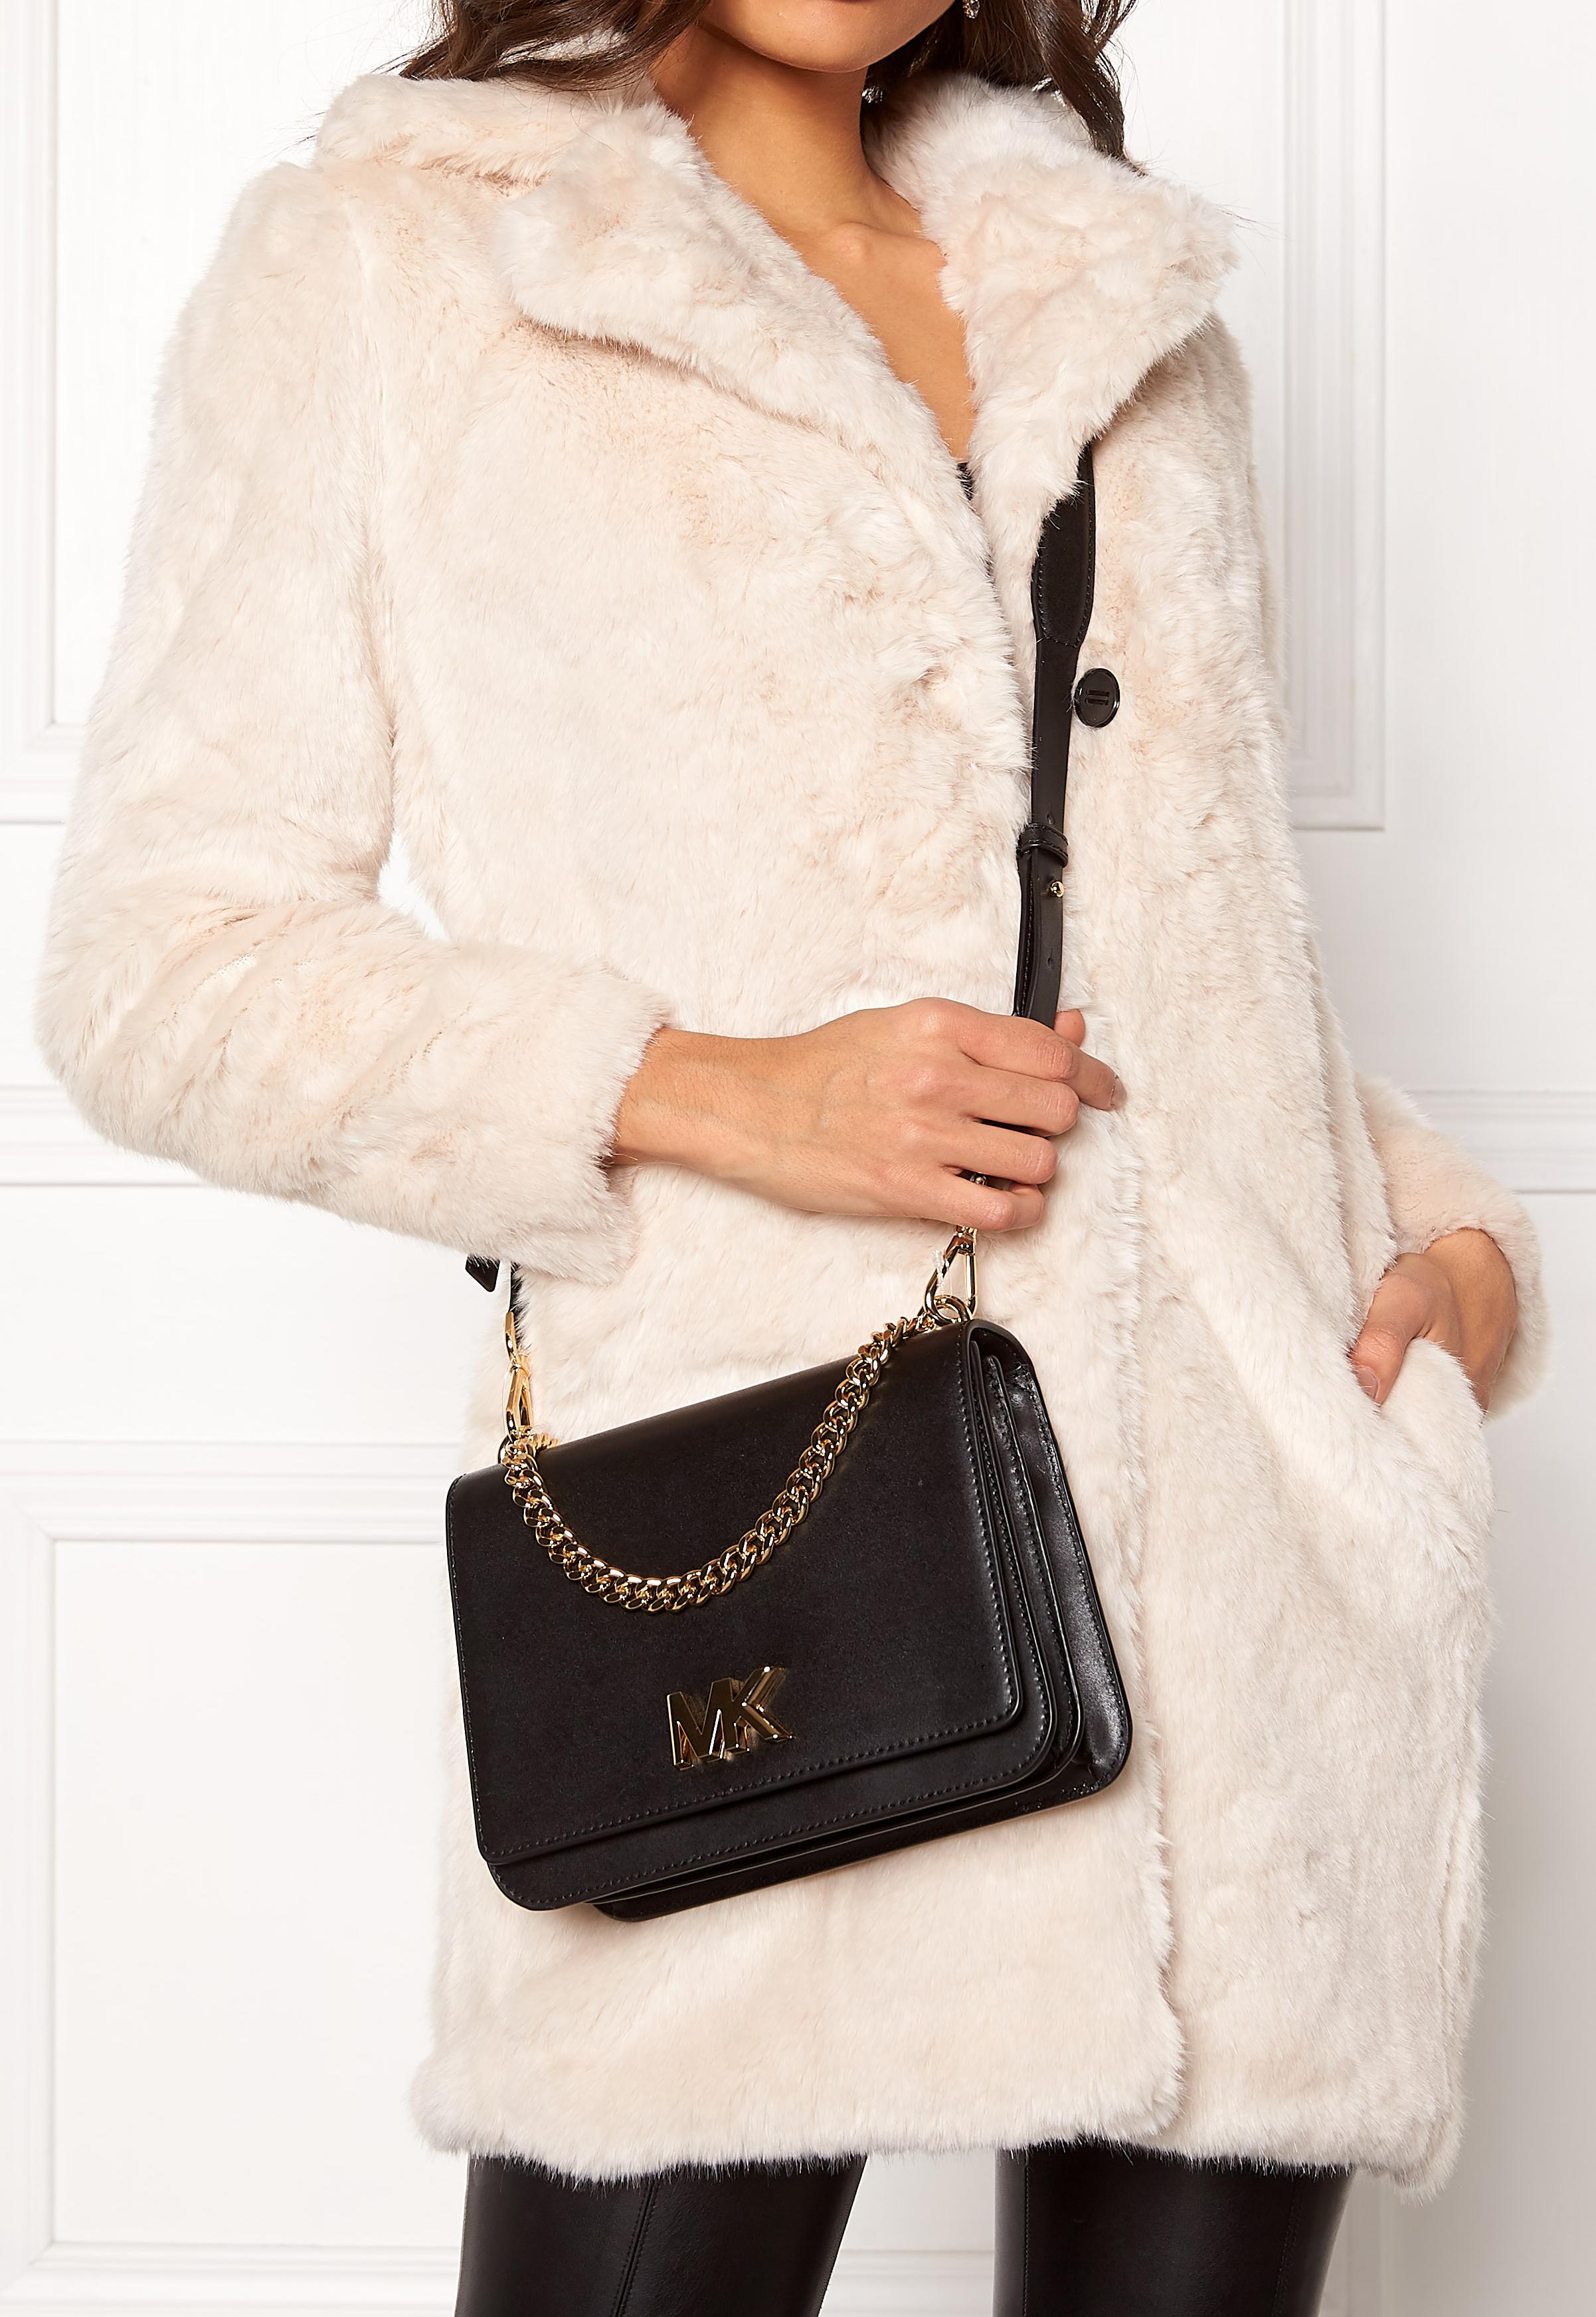 066a8be3eb41 Michael Michael Kors Mott Chain Shoulder Bag Black - Bubbleroom